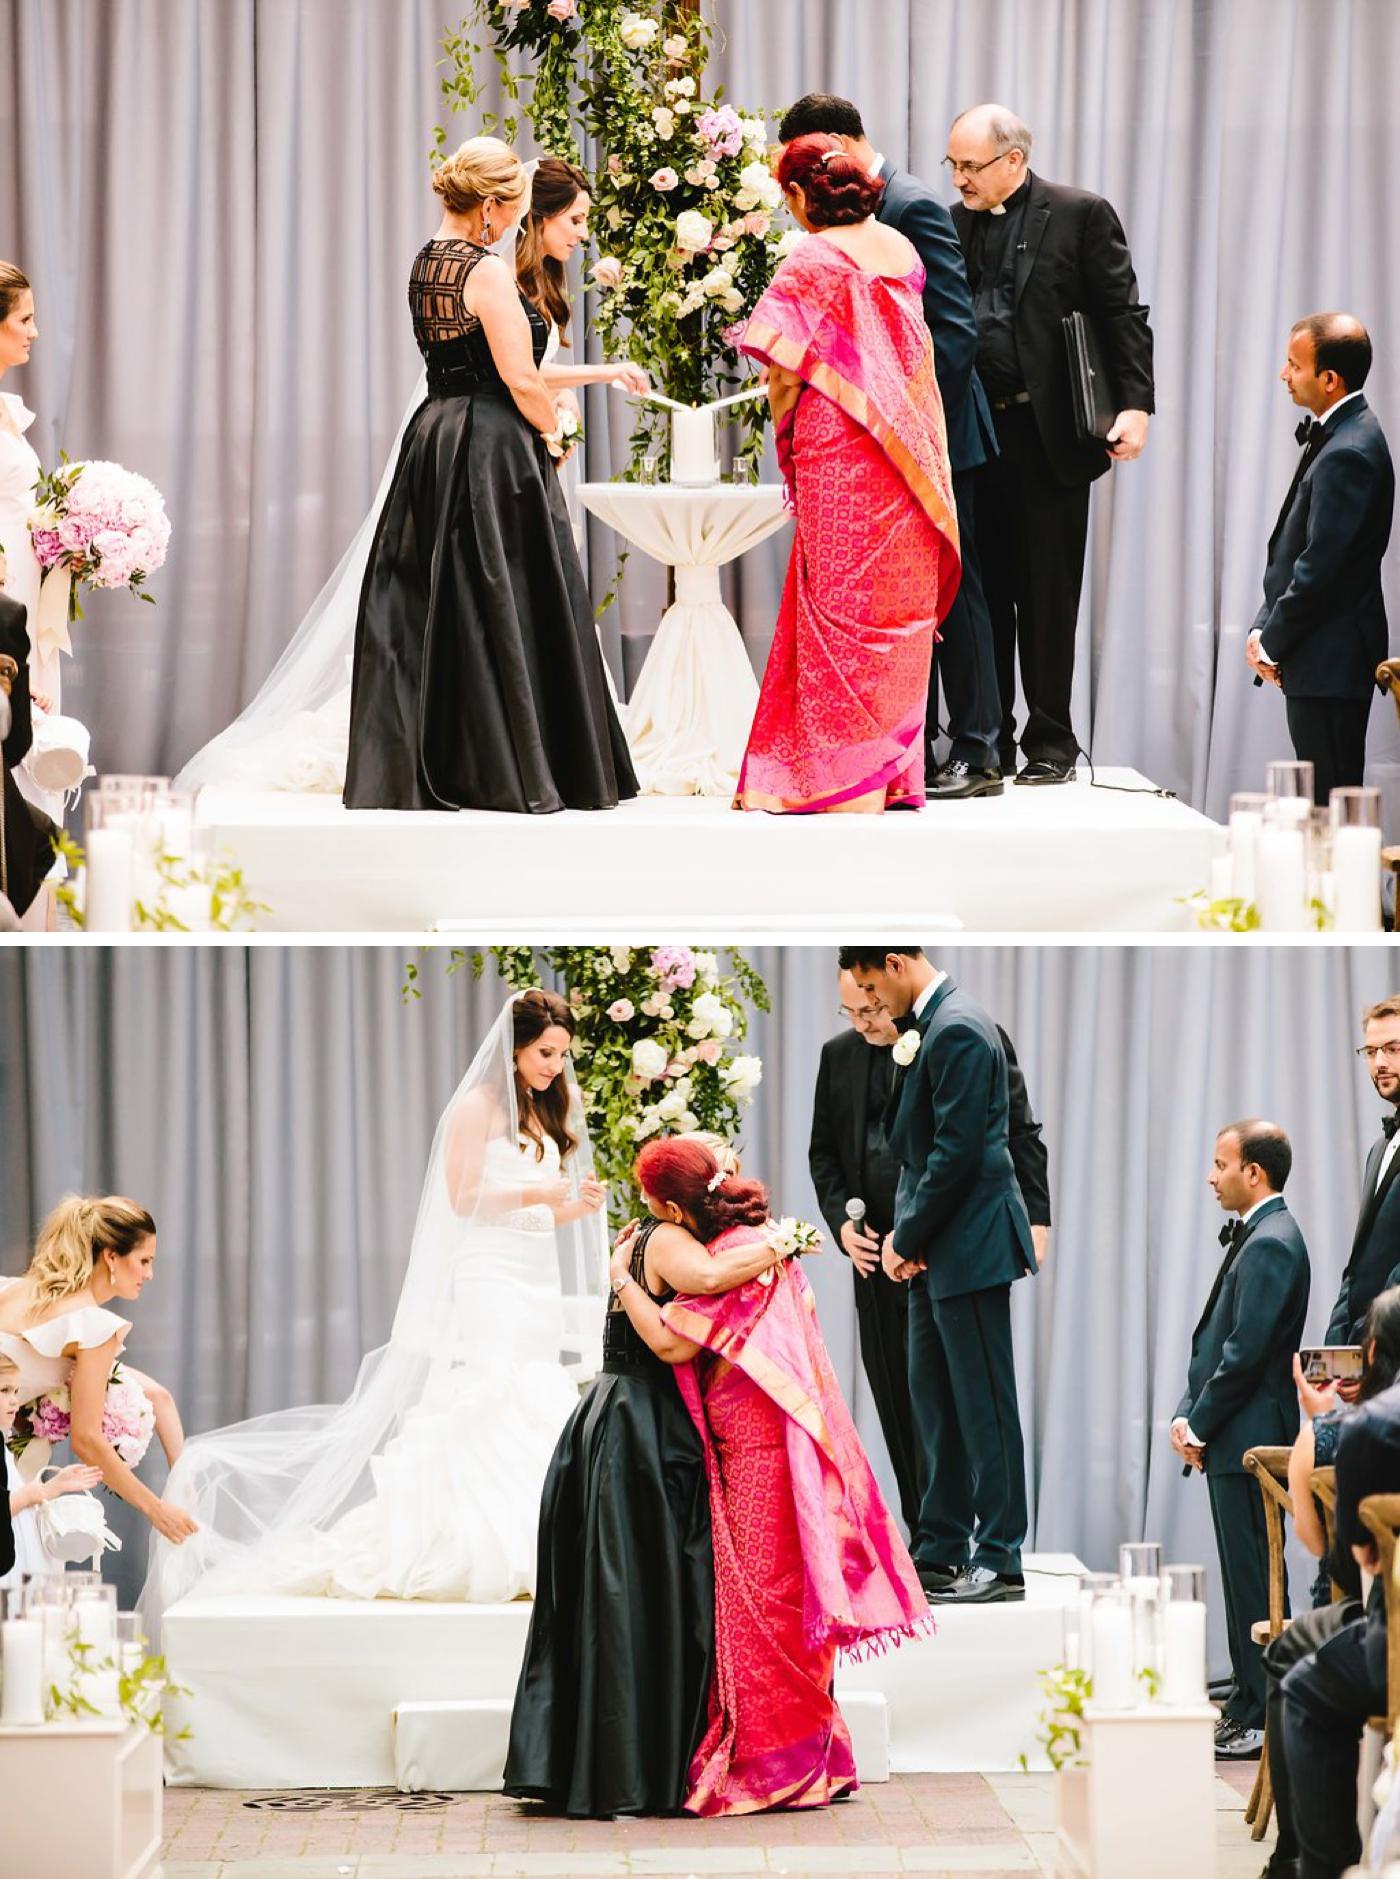 chicago-fine-art-wedding-photography-sakamuri59